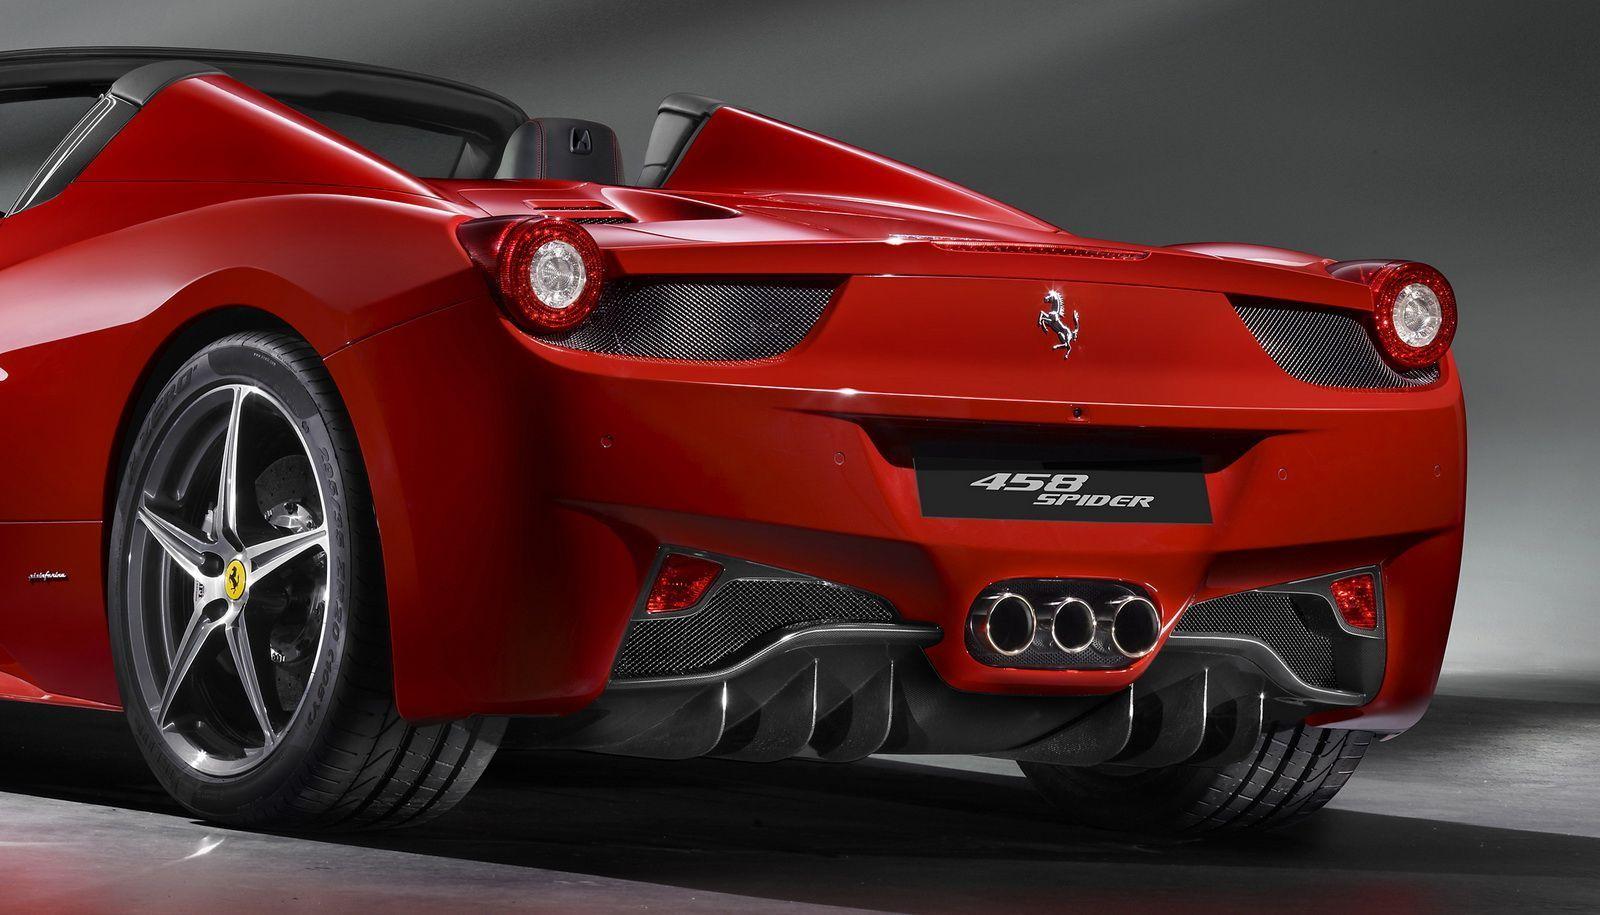 Ferrari 488 Vs 458 Ferrari 458 Italia Vs 488 Gtb Ferrari 458